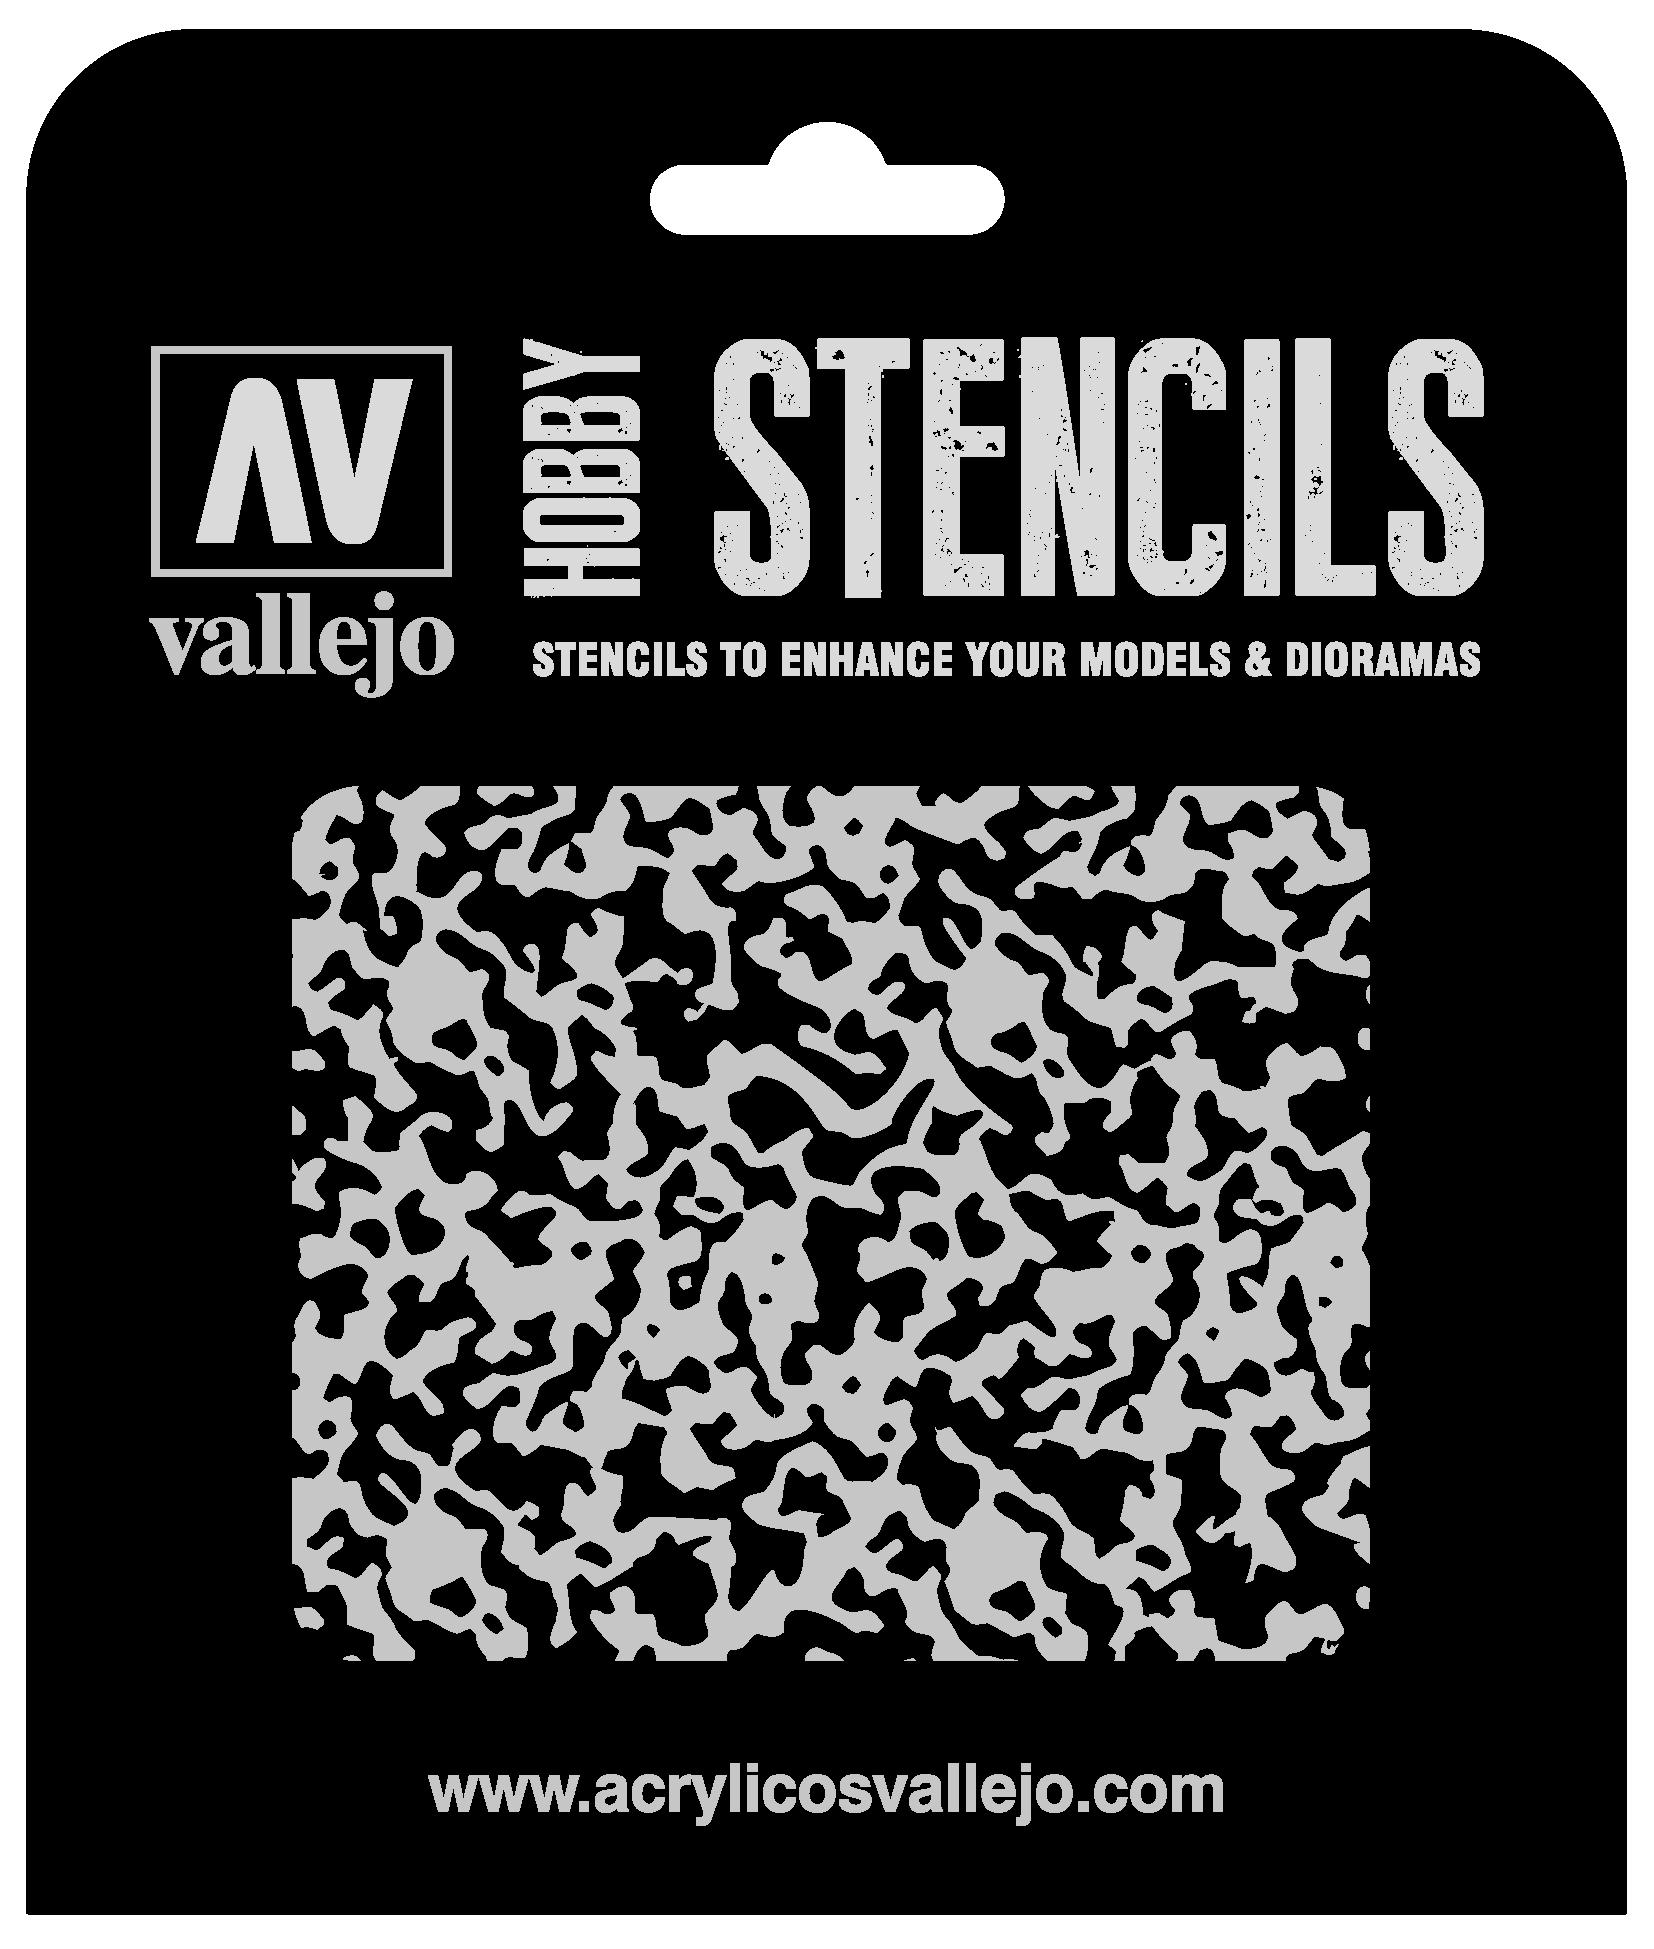 Vallejo ST-AIR001 Verwitterte Farbe 1/48 125 x 125 mm Air Markings Airbrush Schablone